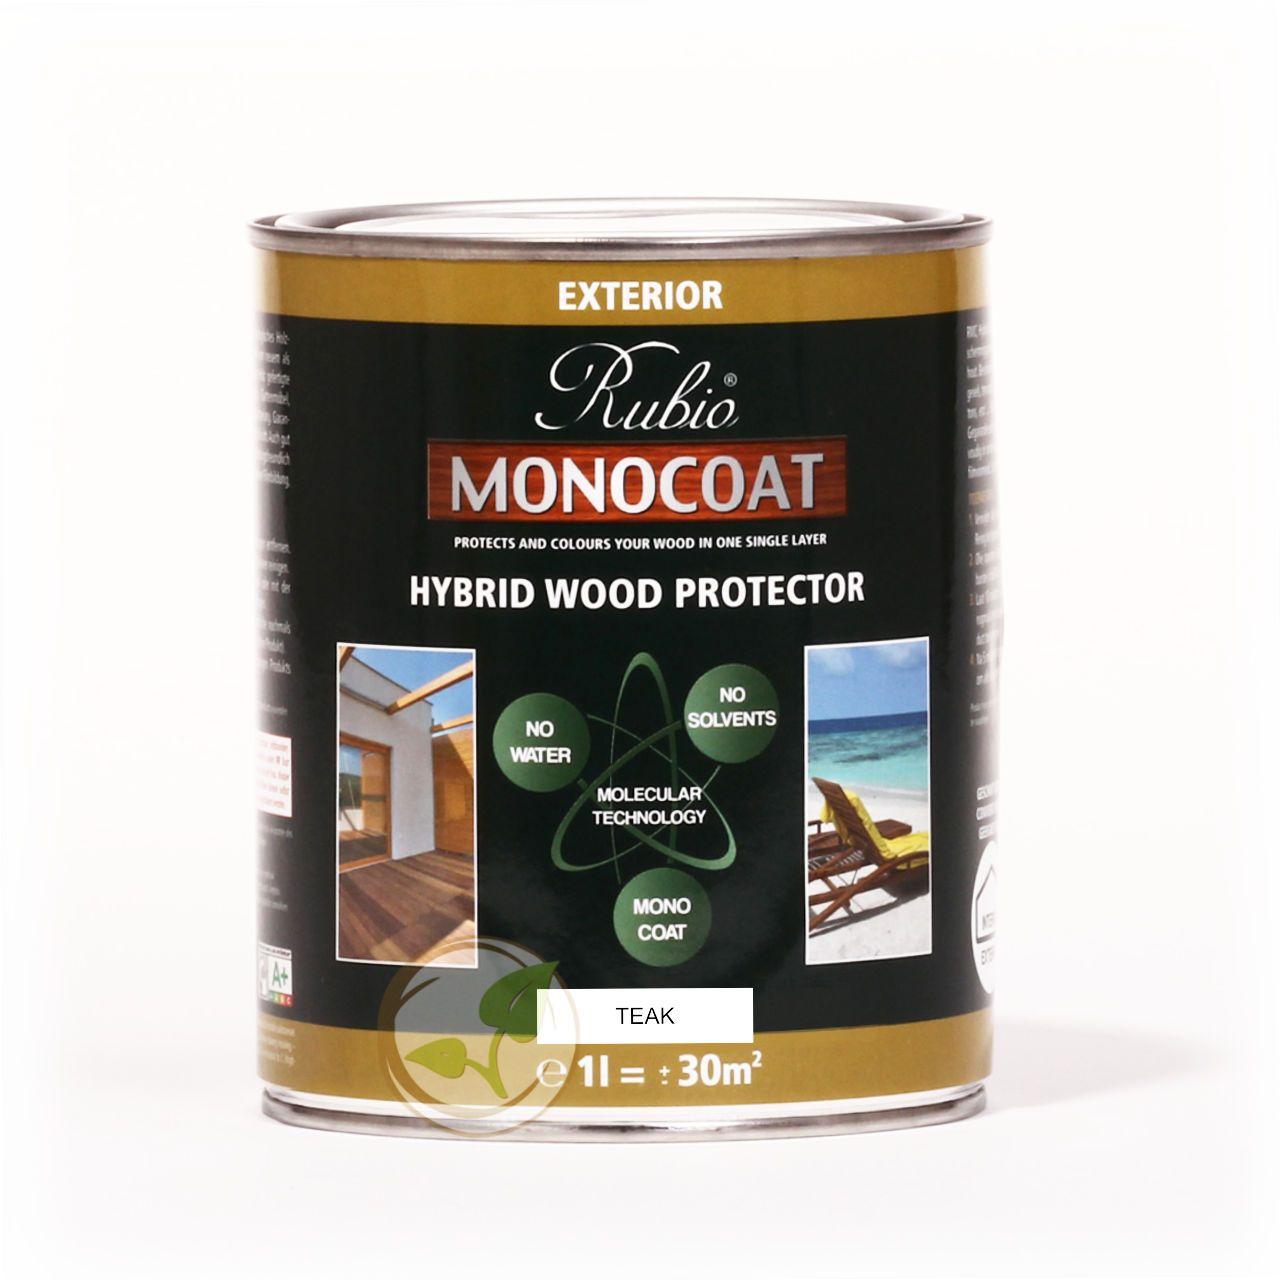 rubio-monocoat-exterior-hybrid-wood-protector-teak-1lBSLxCwwe0gj6y